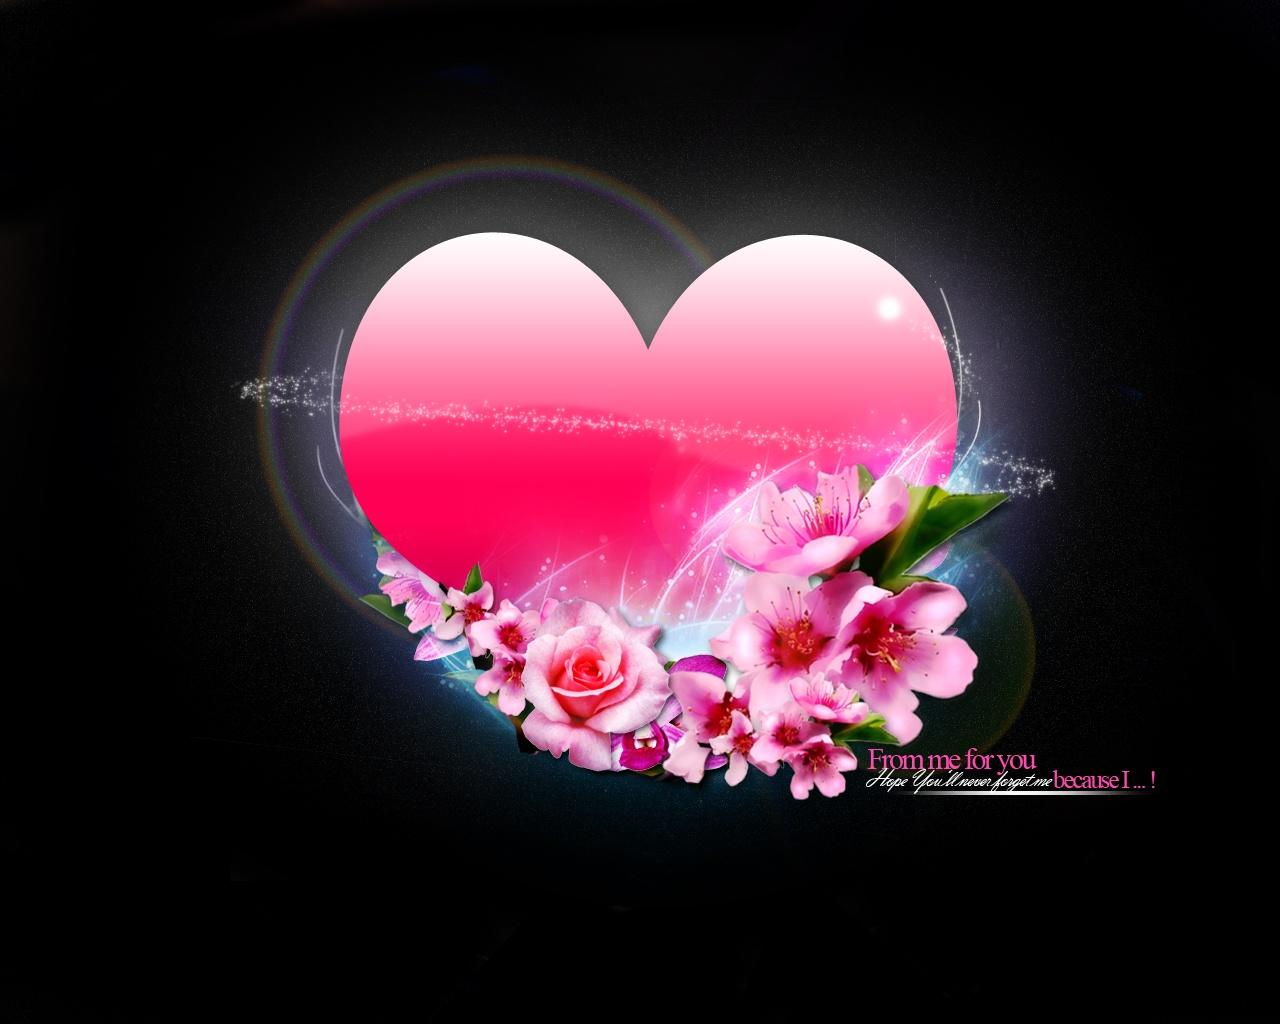 Gambar Beautiful I Love You Hearts